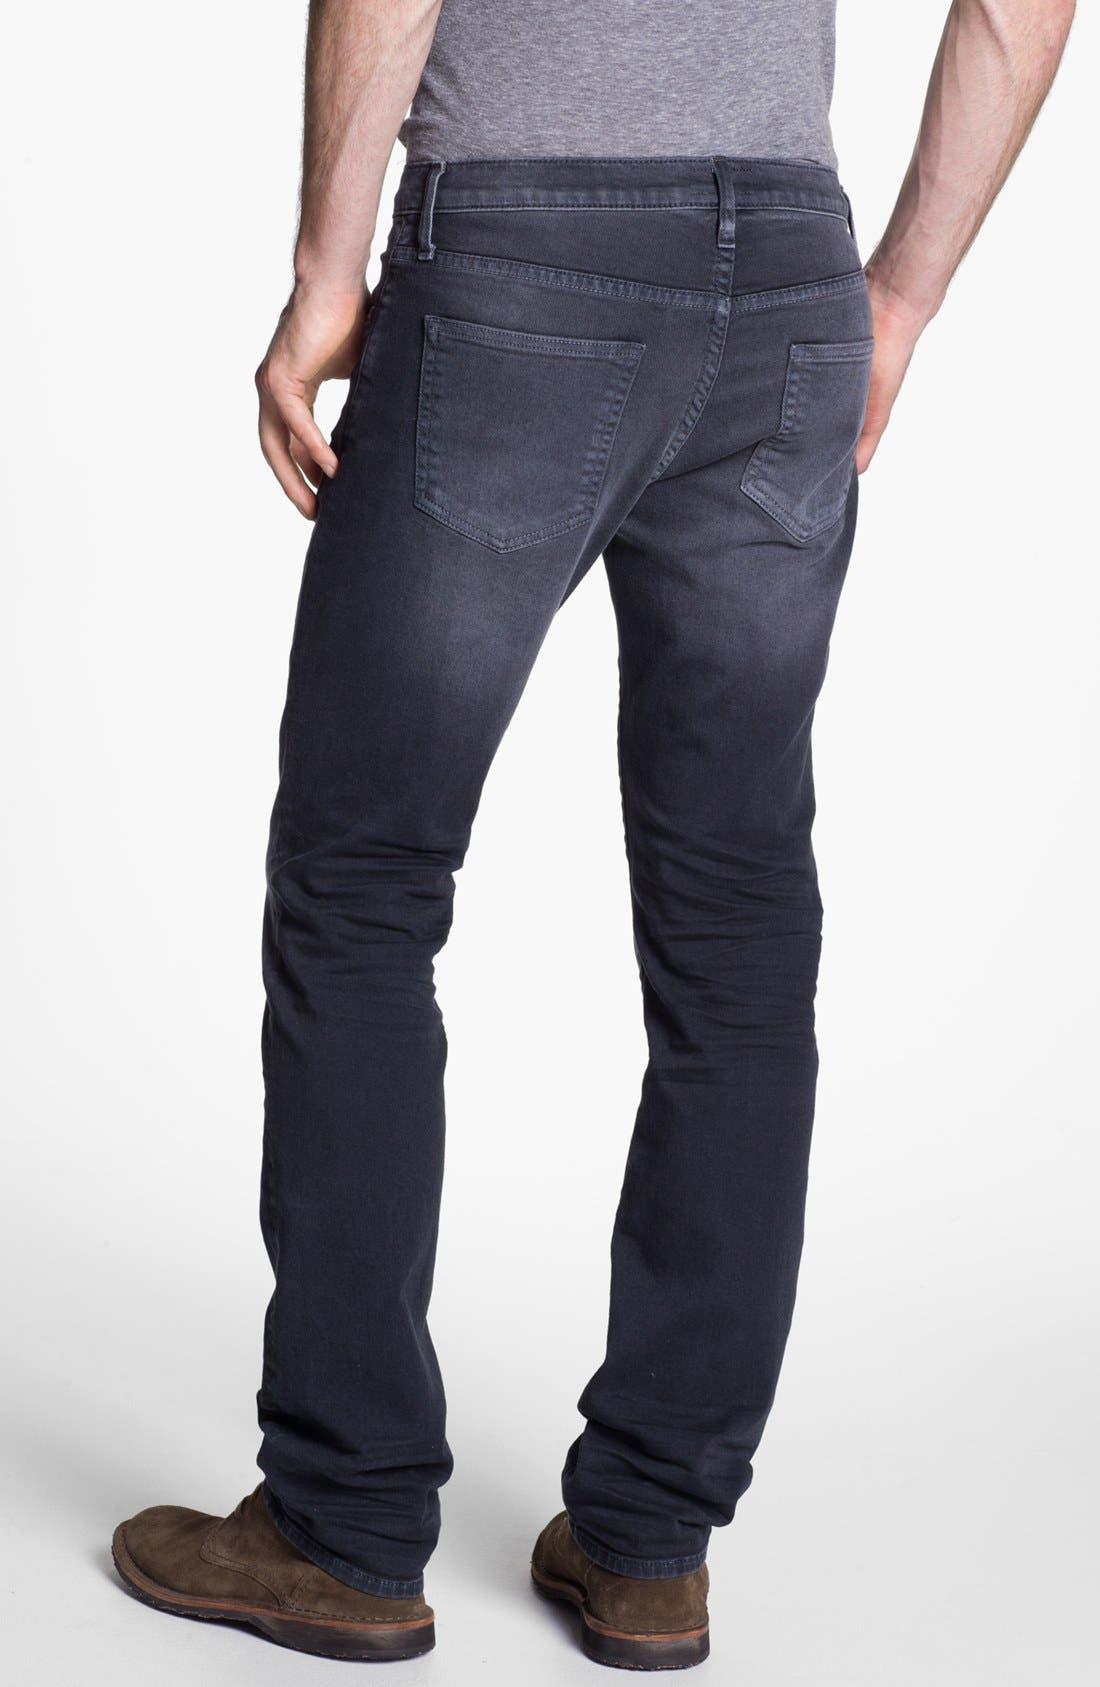 Main Image - Koral 'Los Angeles' Slim Leg Jeans (Worn Black)